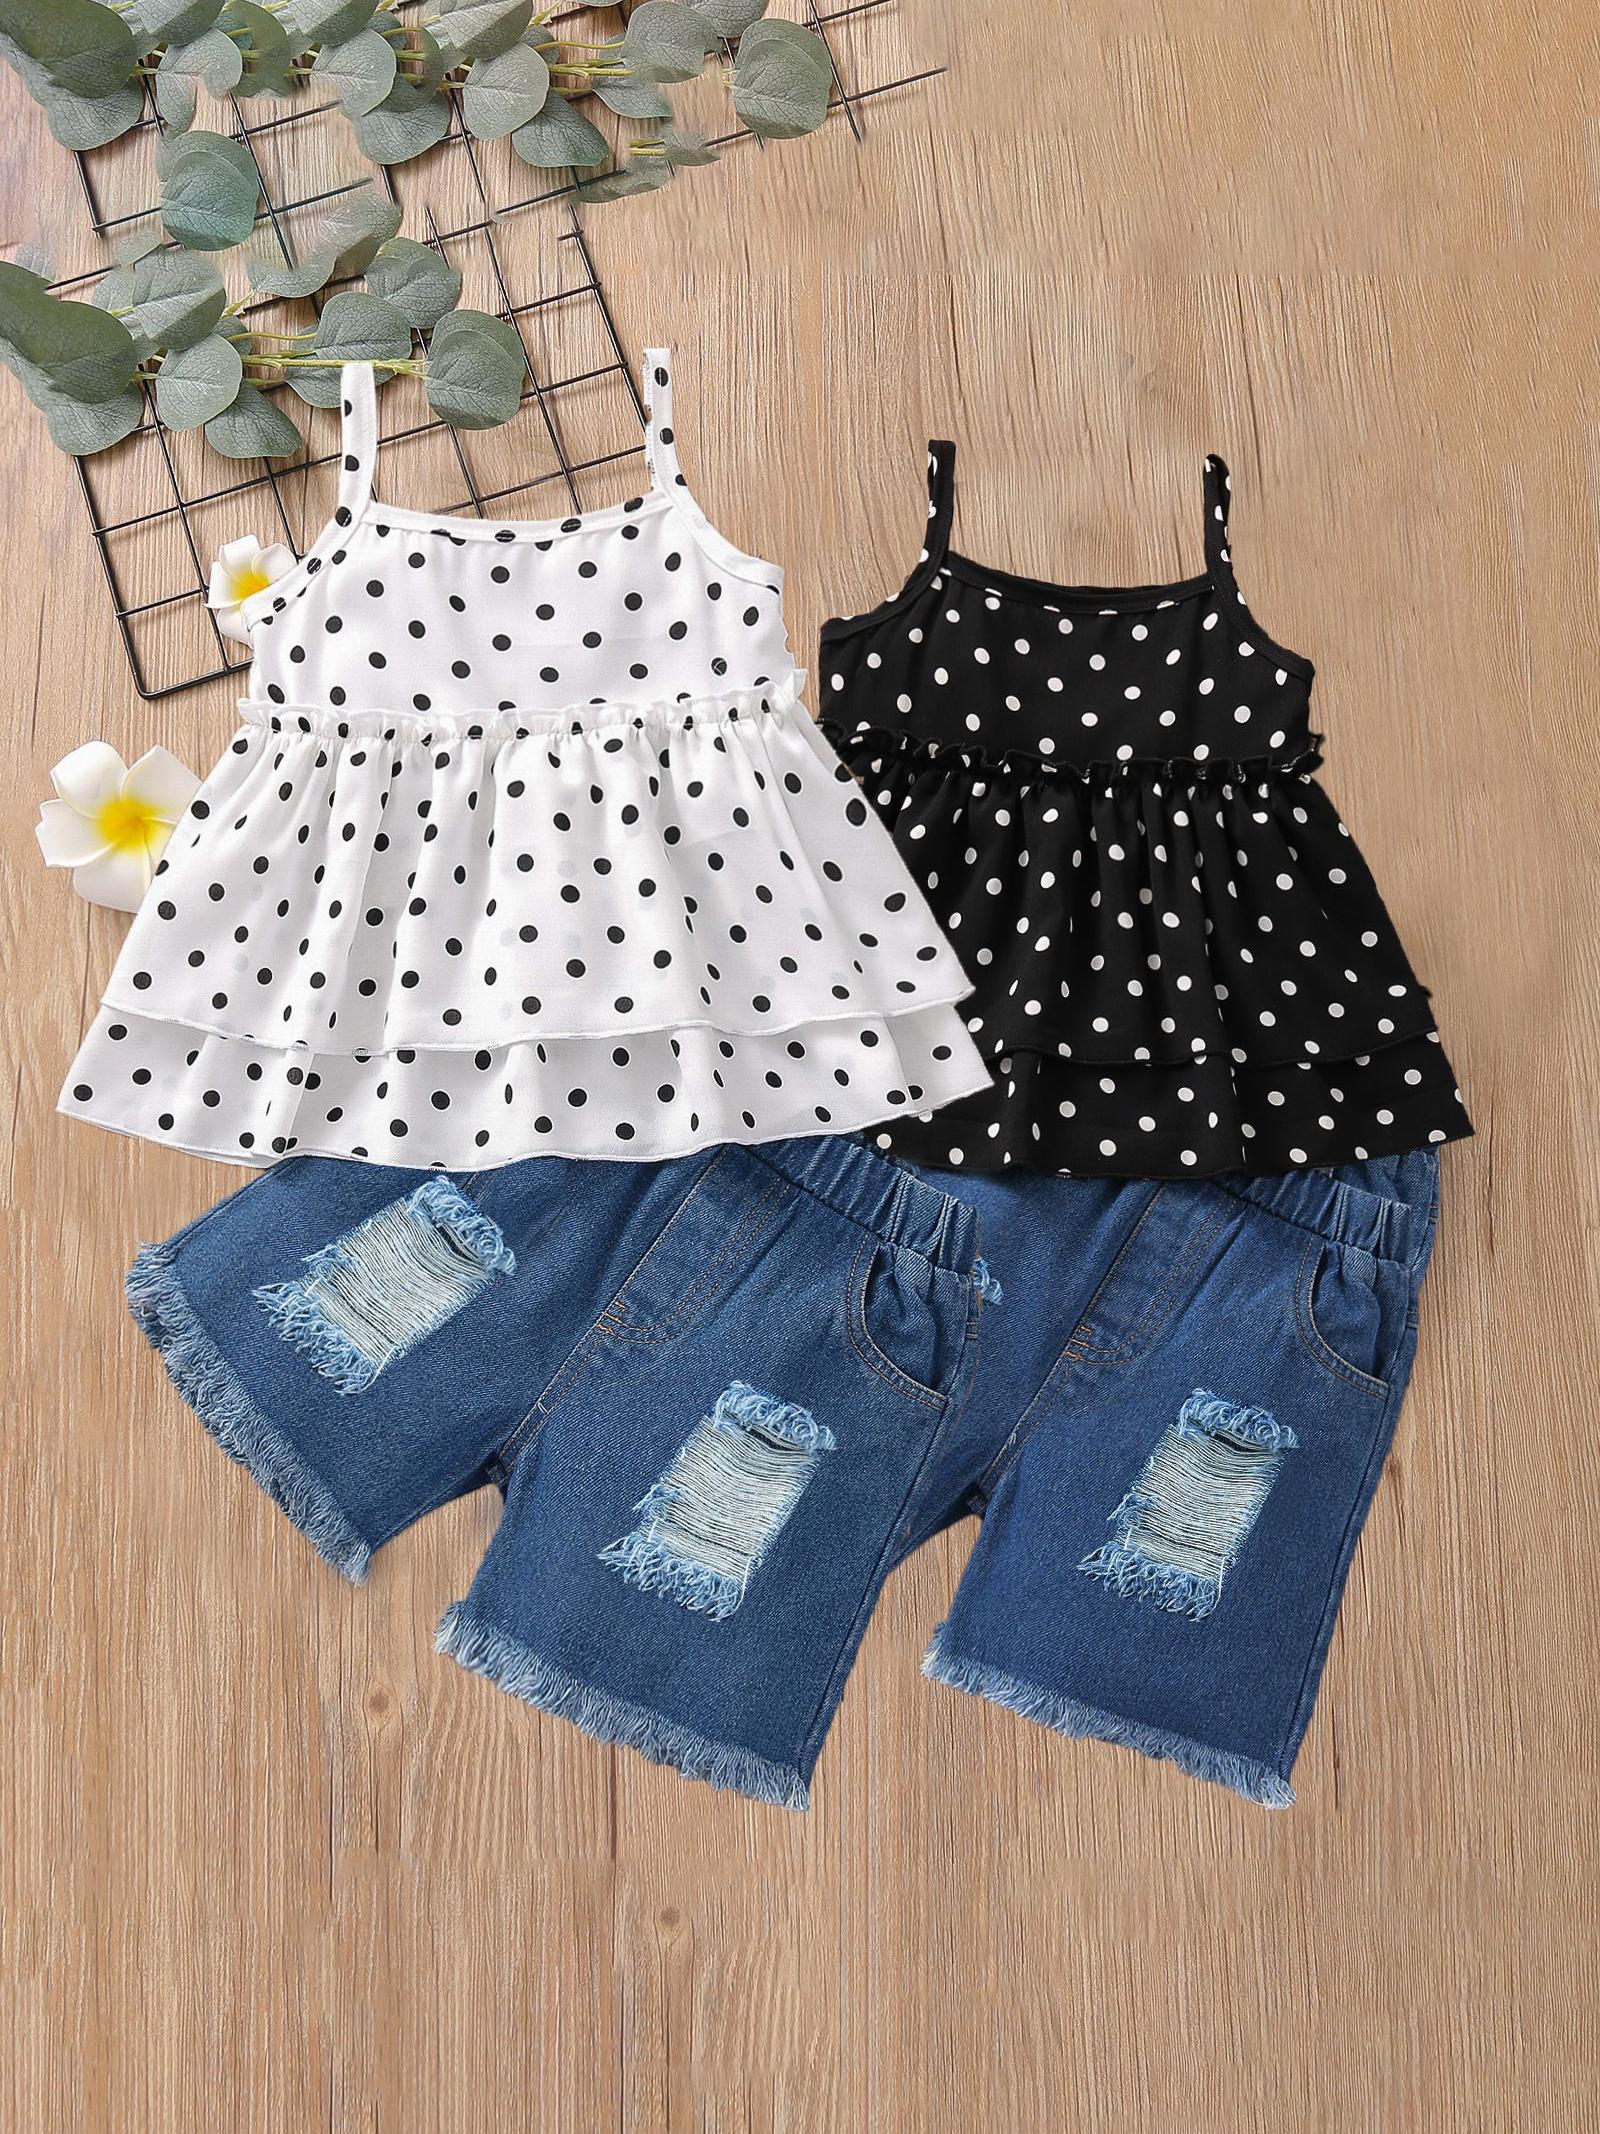 Fashion Dot Sleeveless Top And Pant Set